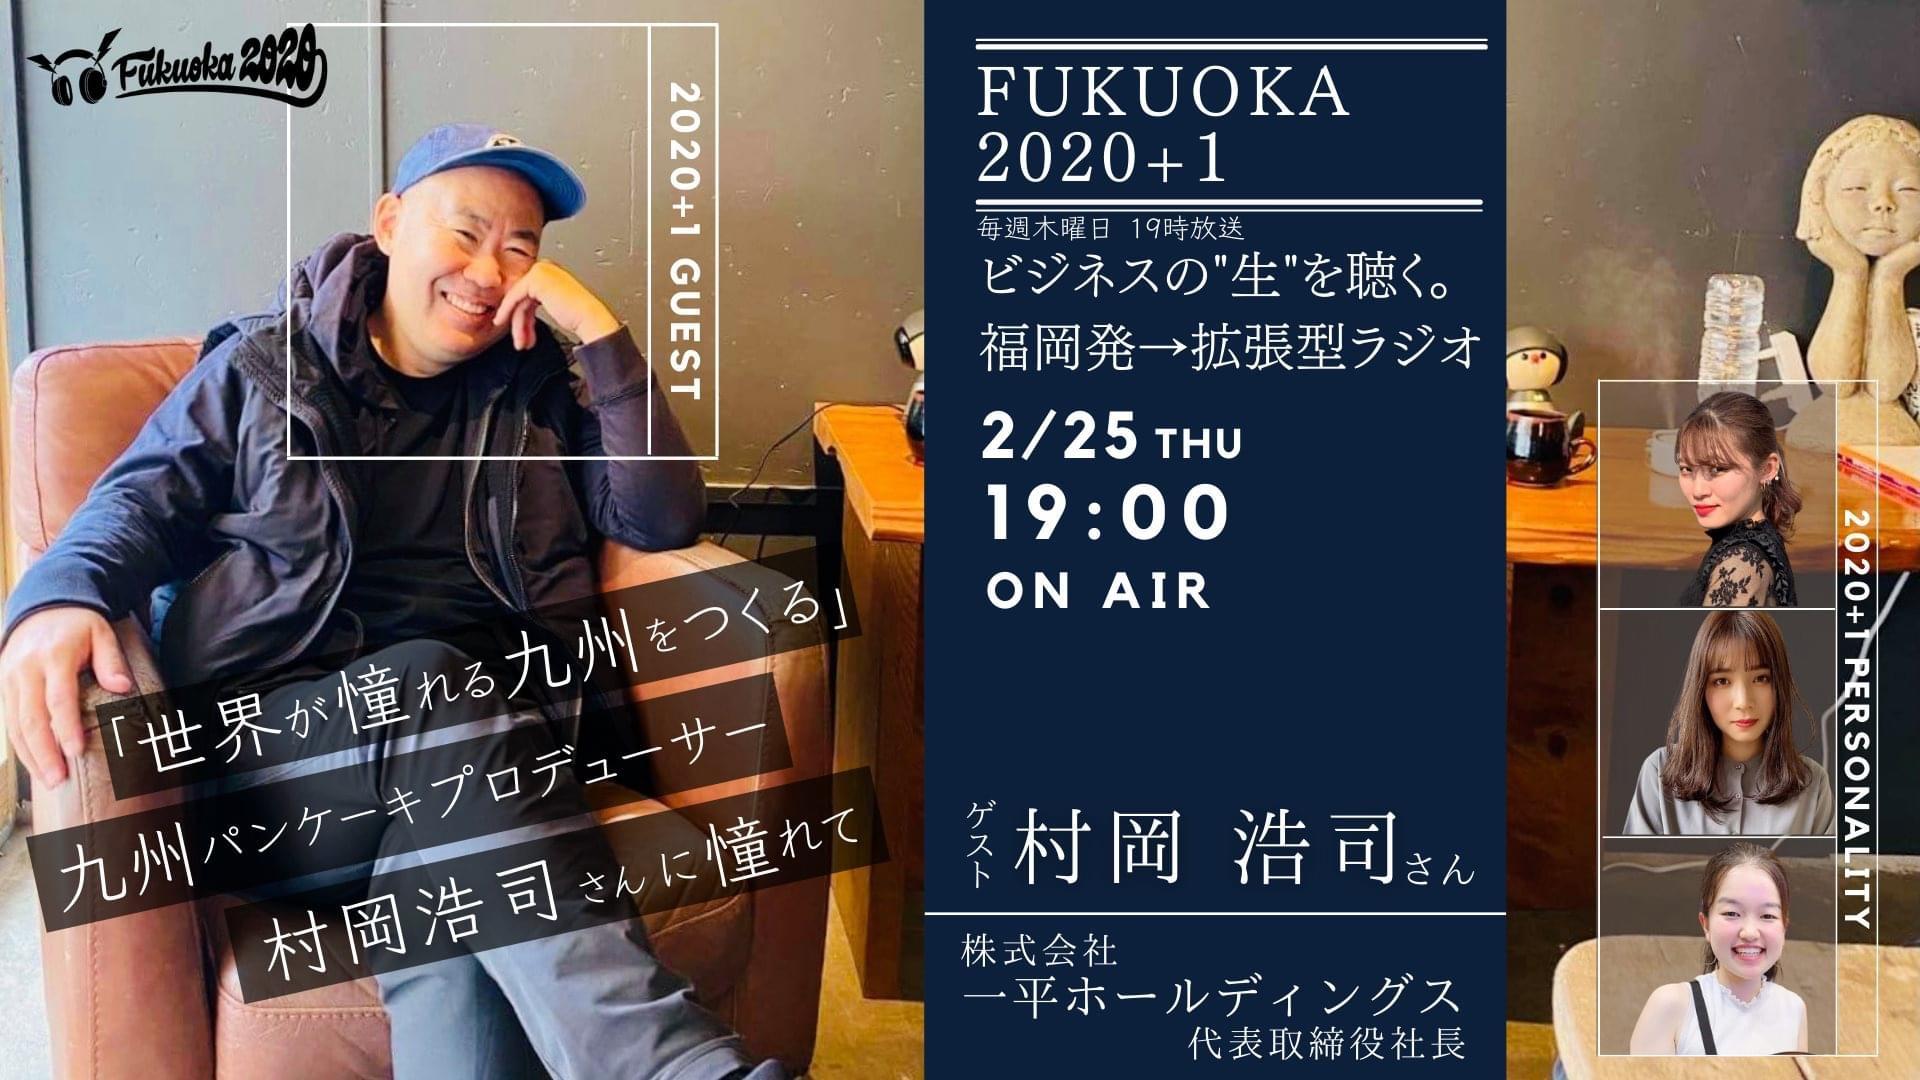 【LIVE】FUKUOKA2020 vol.126 |ゲスト:株式会社 一平ホールディングス代表取締役社⻑ 村岡浩司さん